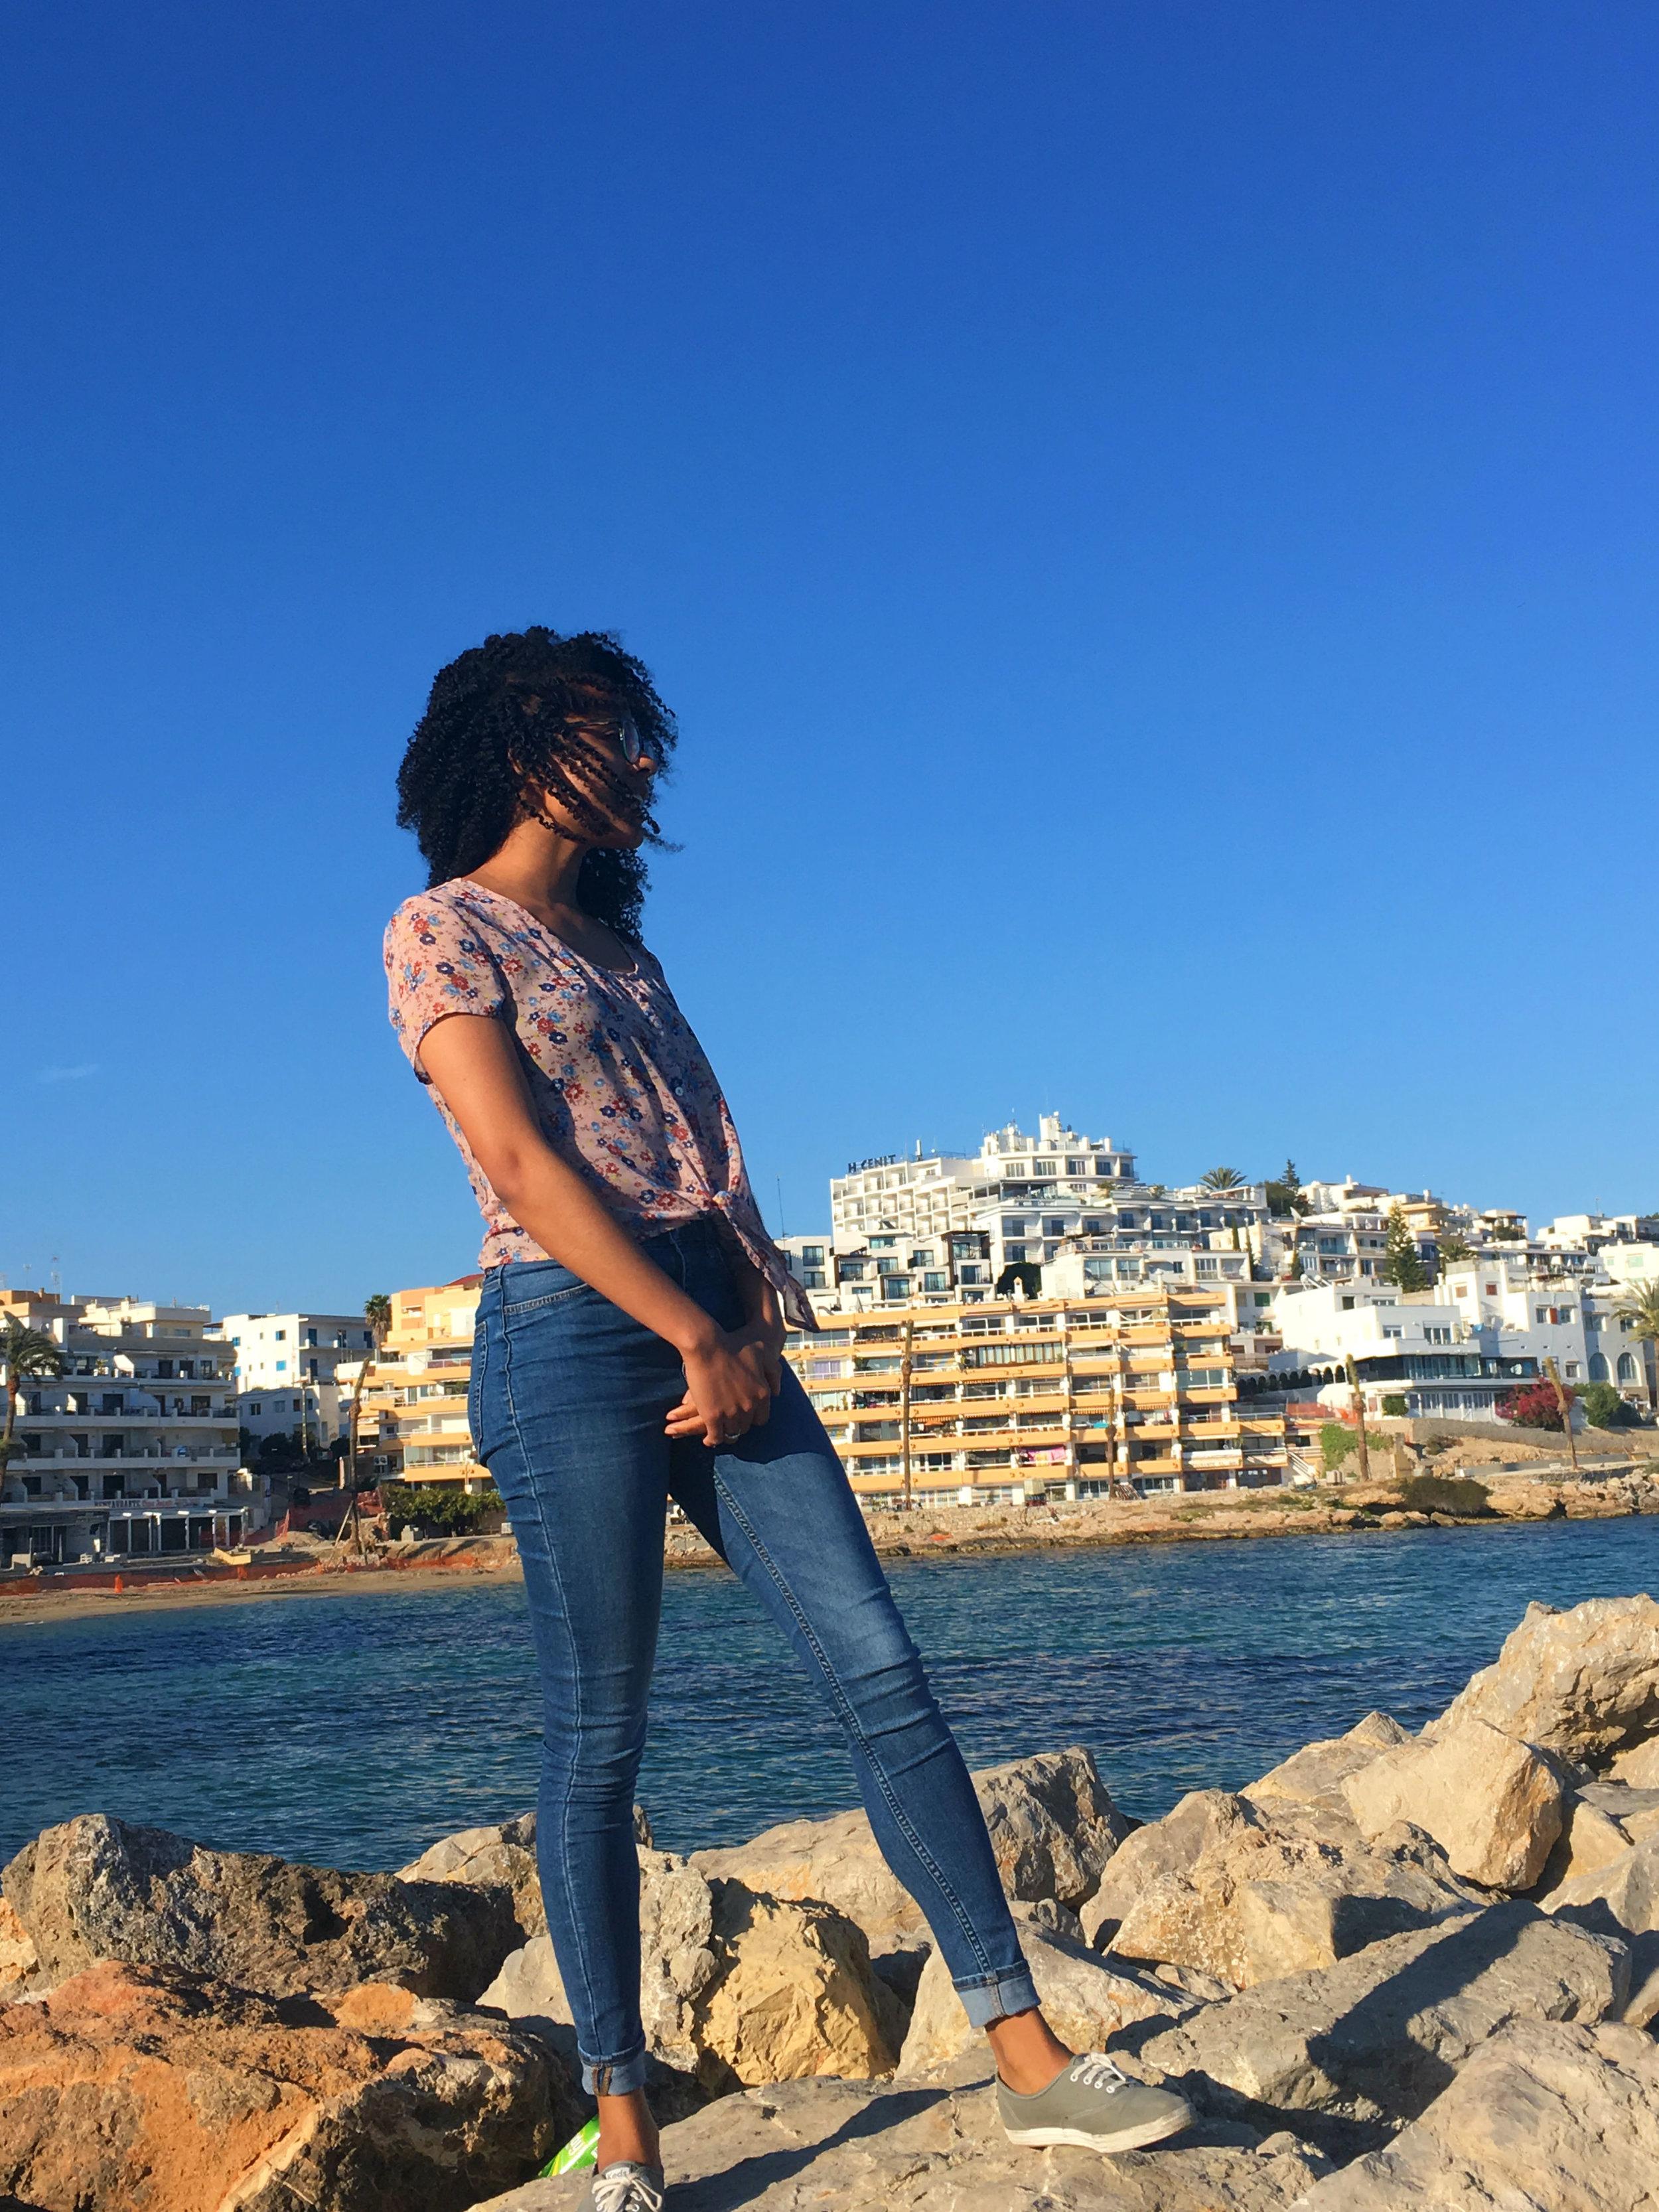 Steph_Ibiza_Rocks.jpg